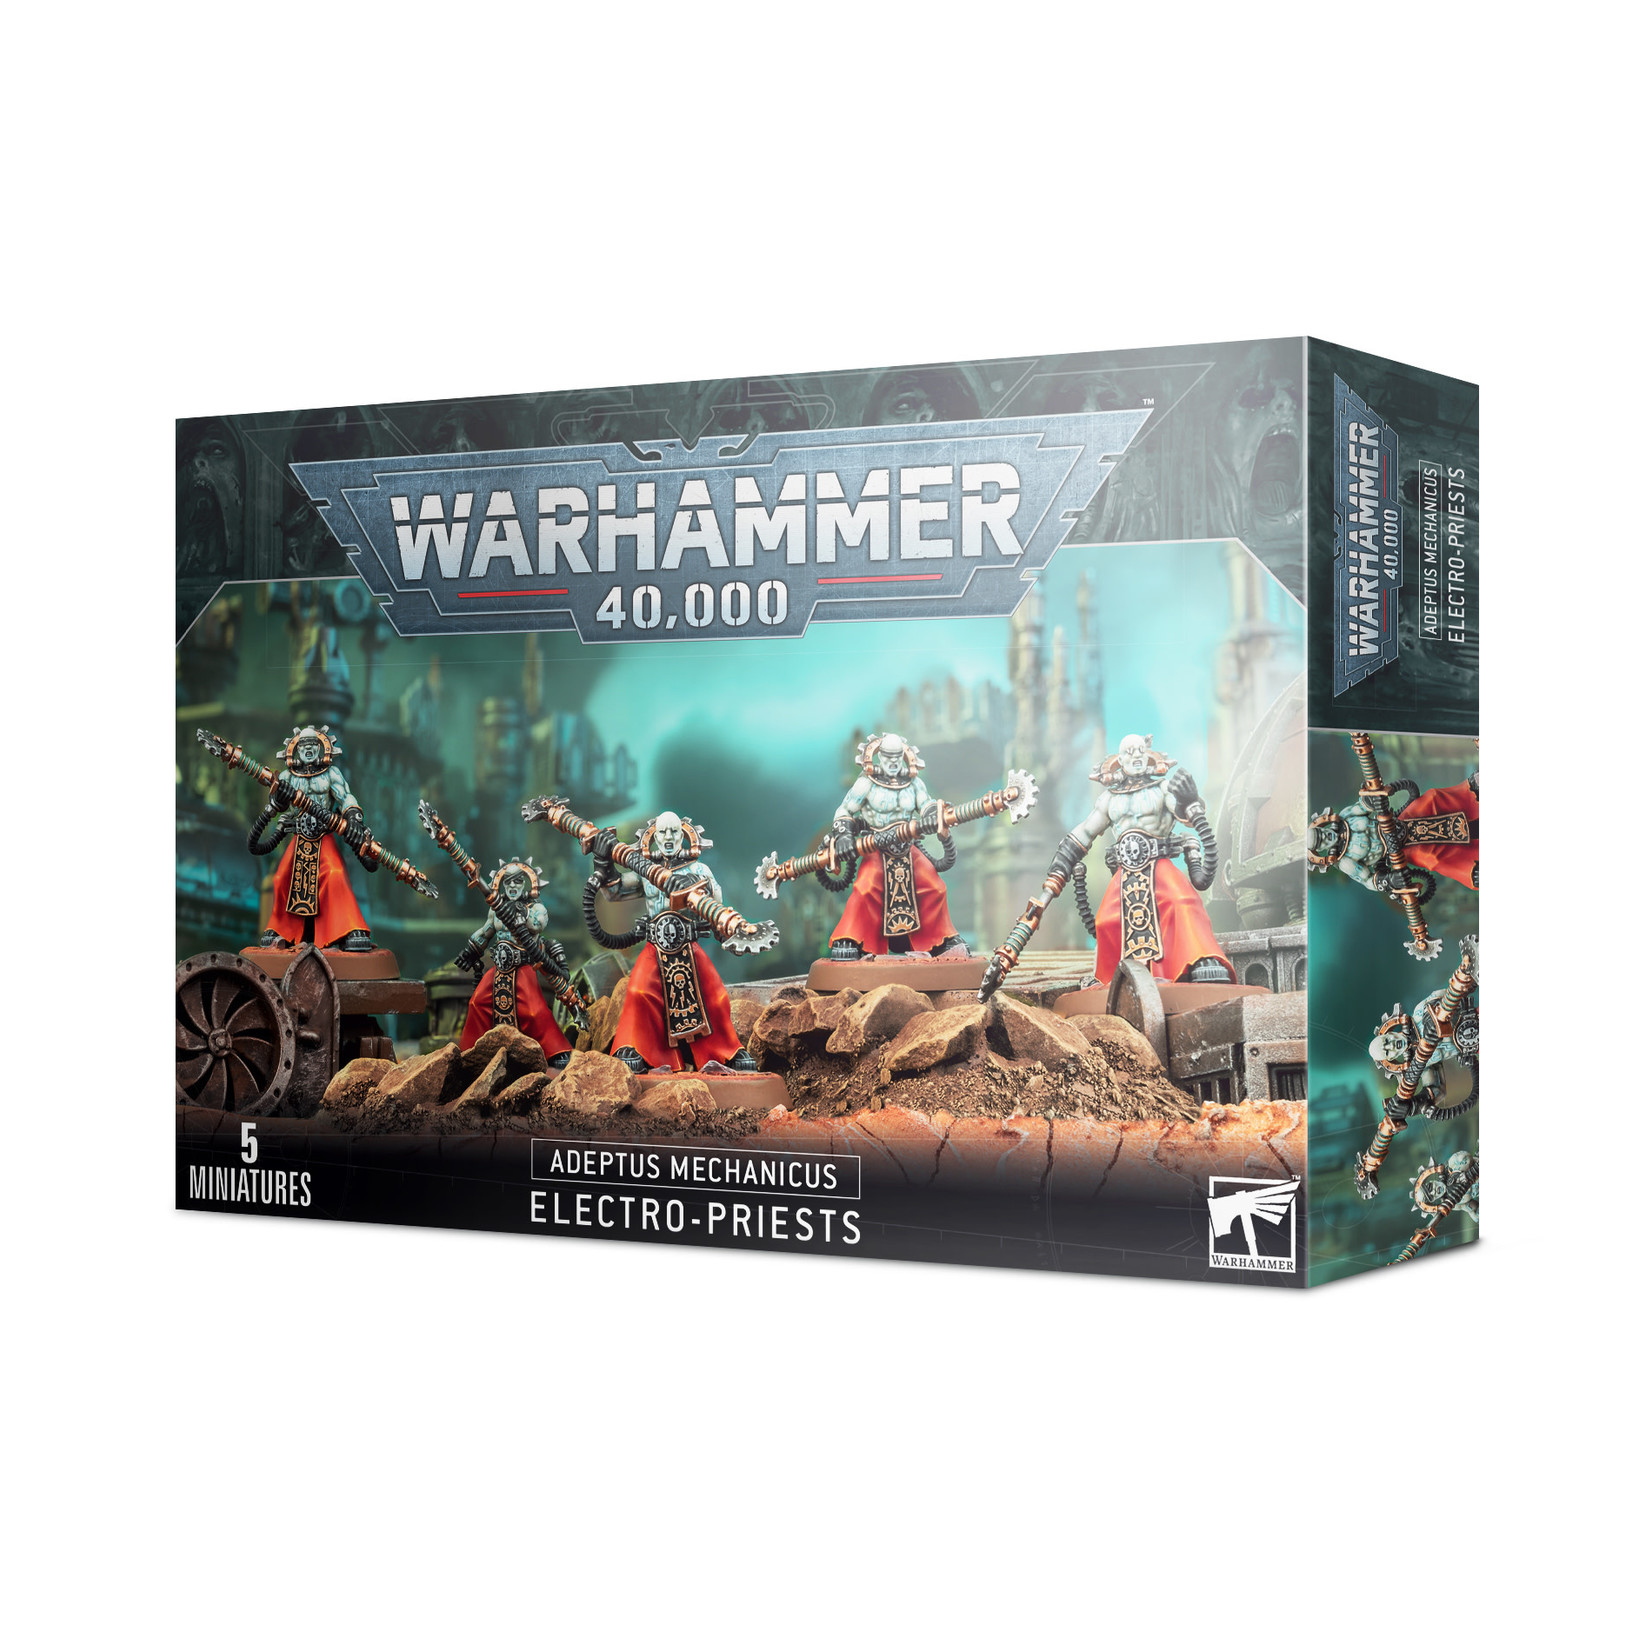 Games Workshop Warhammer 40k: Adeptus Mechanicus - Electro-Priests